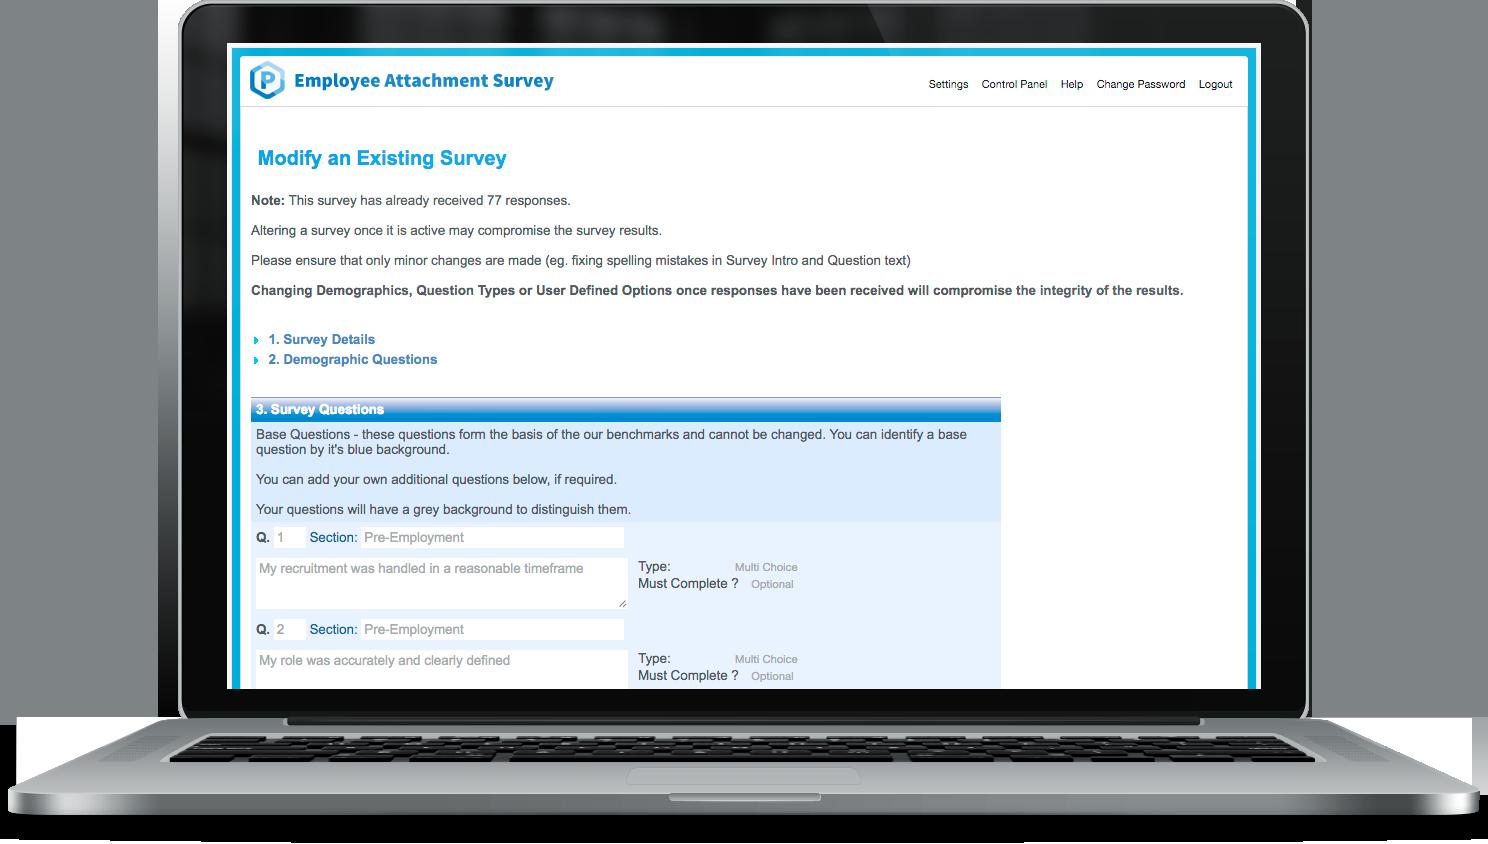 Employee Attachment Survey